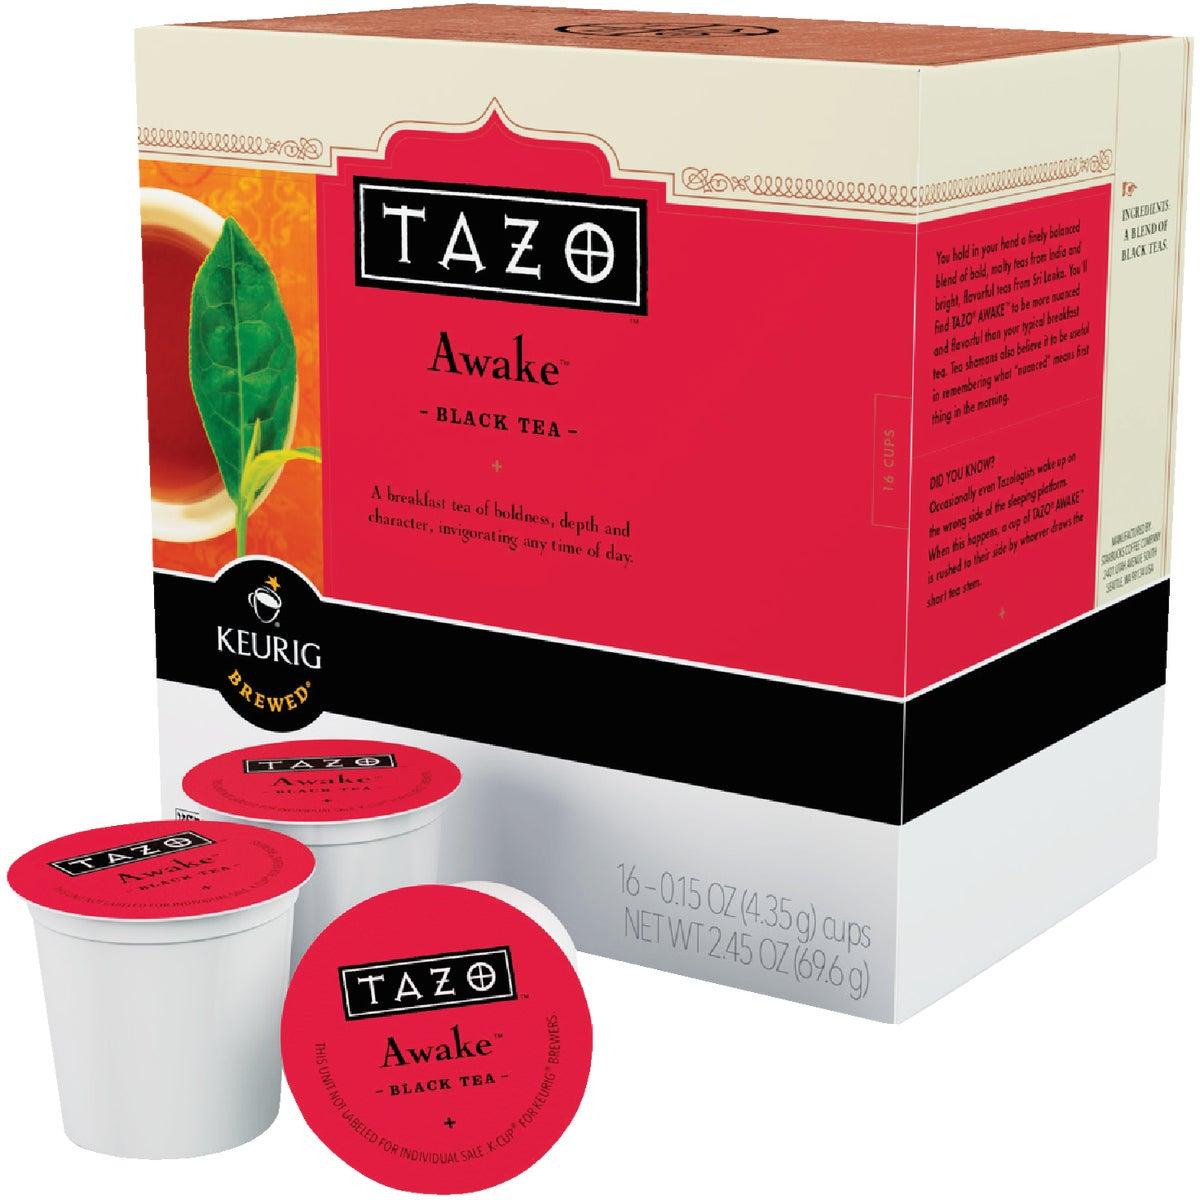 16CT TZO AWAKE TEA K-CUP - 10518 by Keurig     M Block